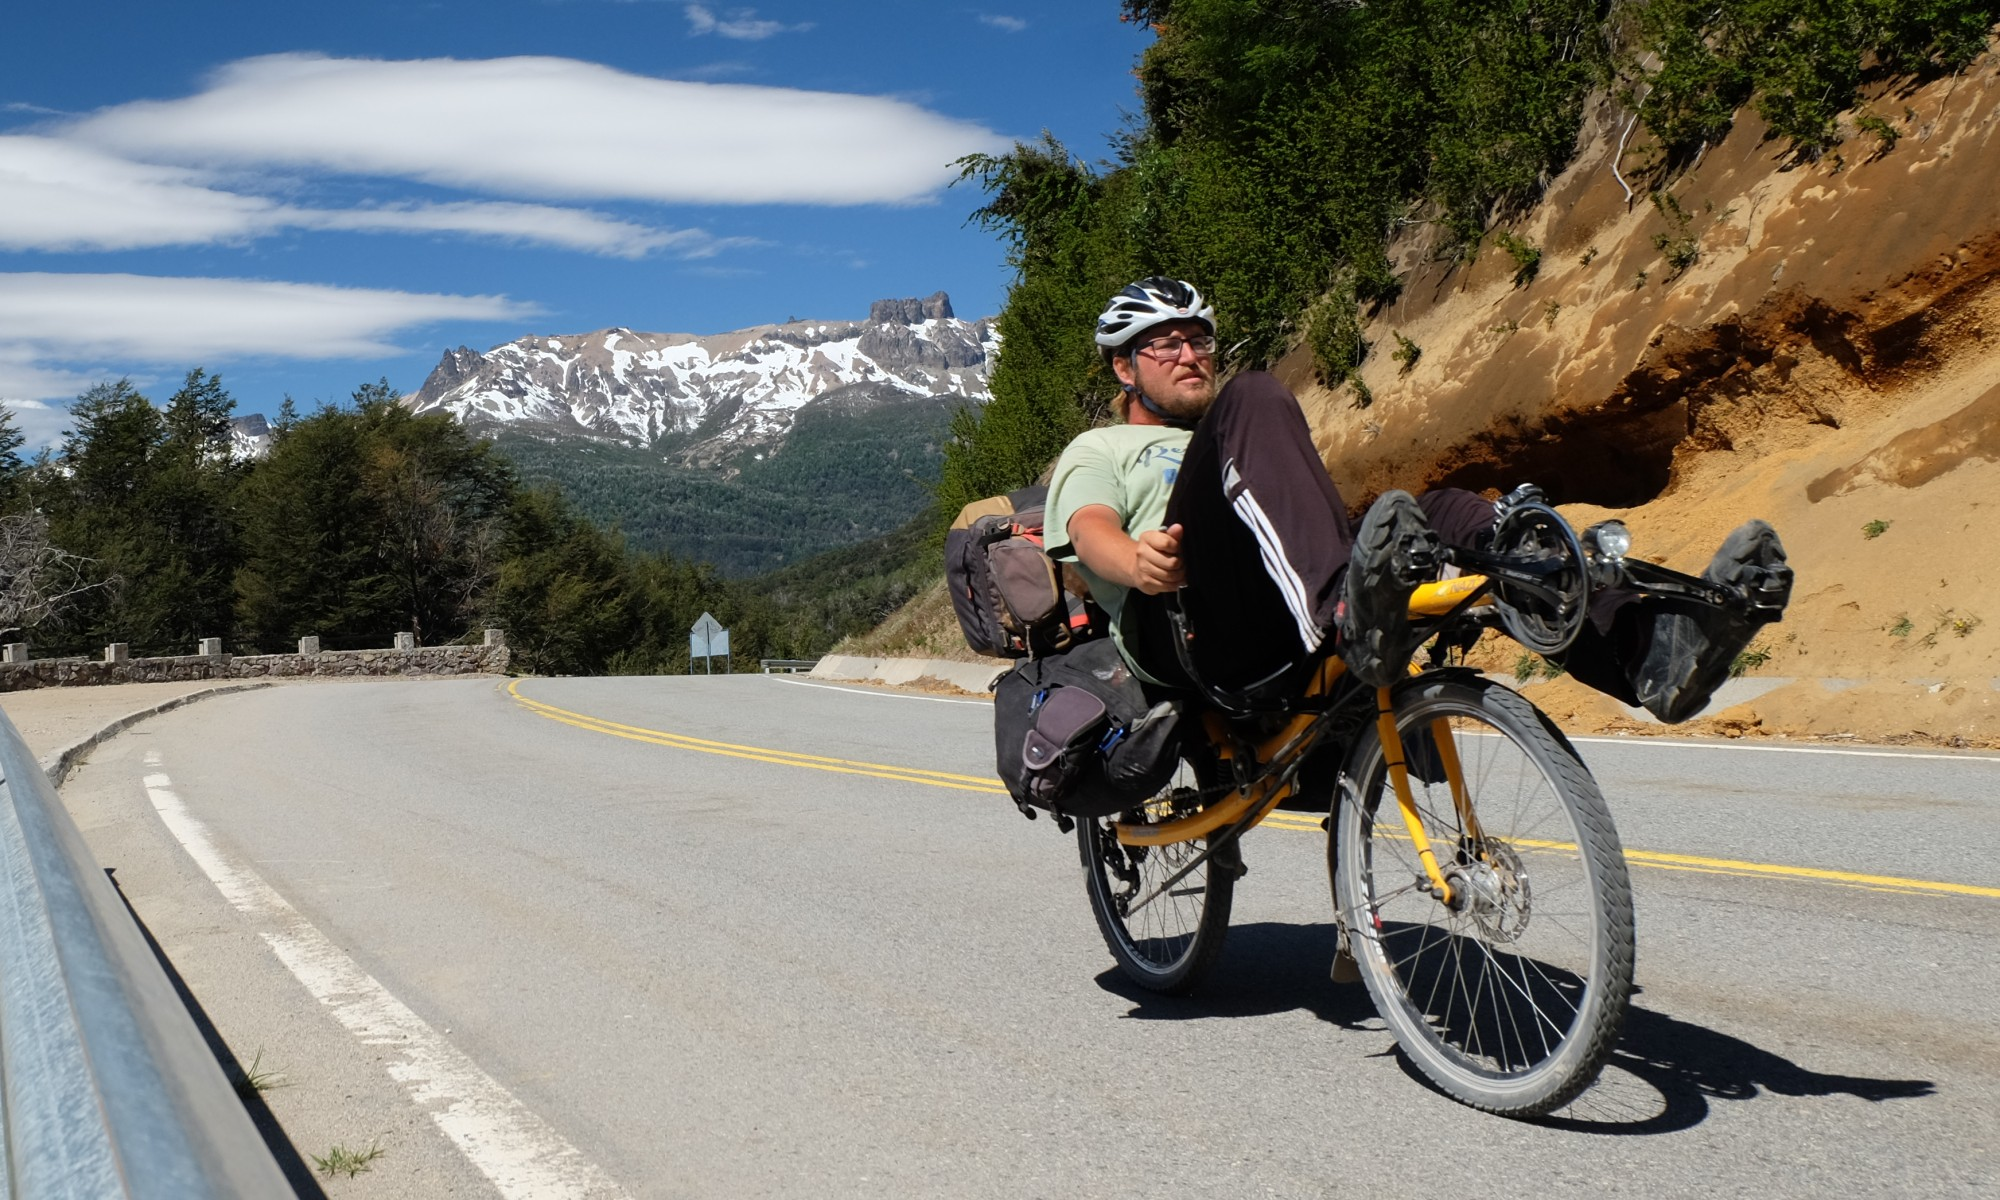 The Lazy Rider